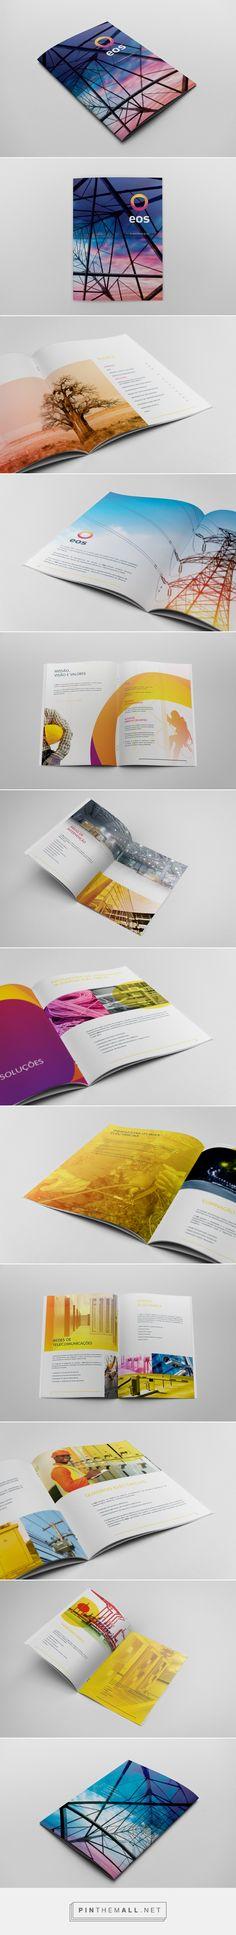 EOS Brochure by Miagrphx & João Fernandes #mywork #portfolio #eos #brochure